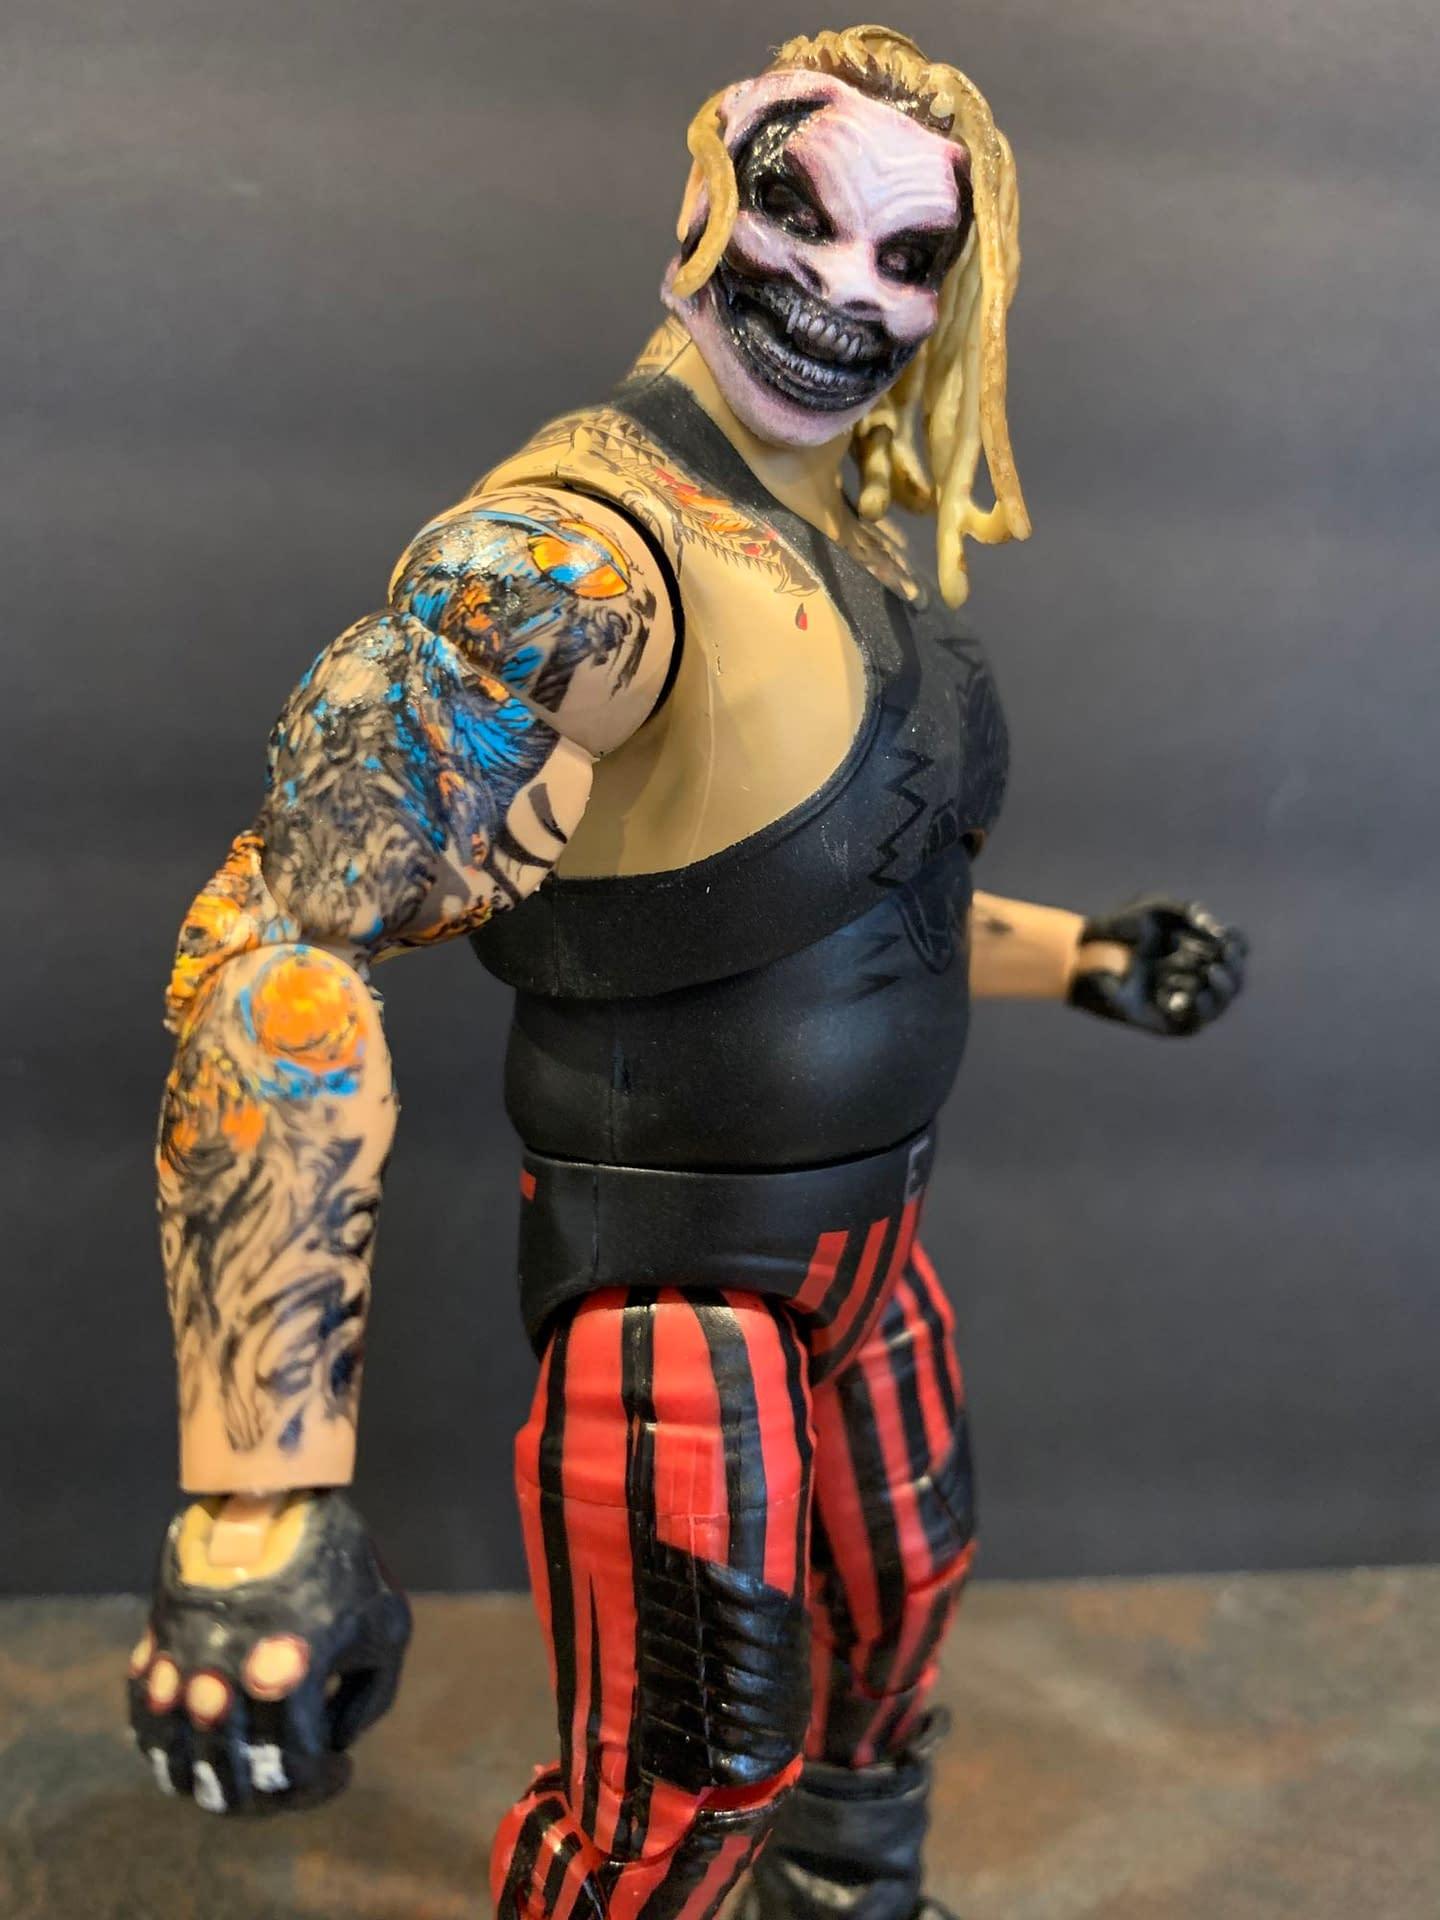 Let's Look At Mattel's Hollywood Hogan & Fiend Ultimate WWE Figures